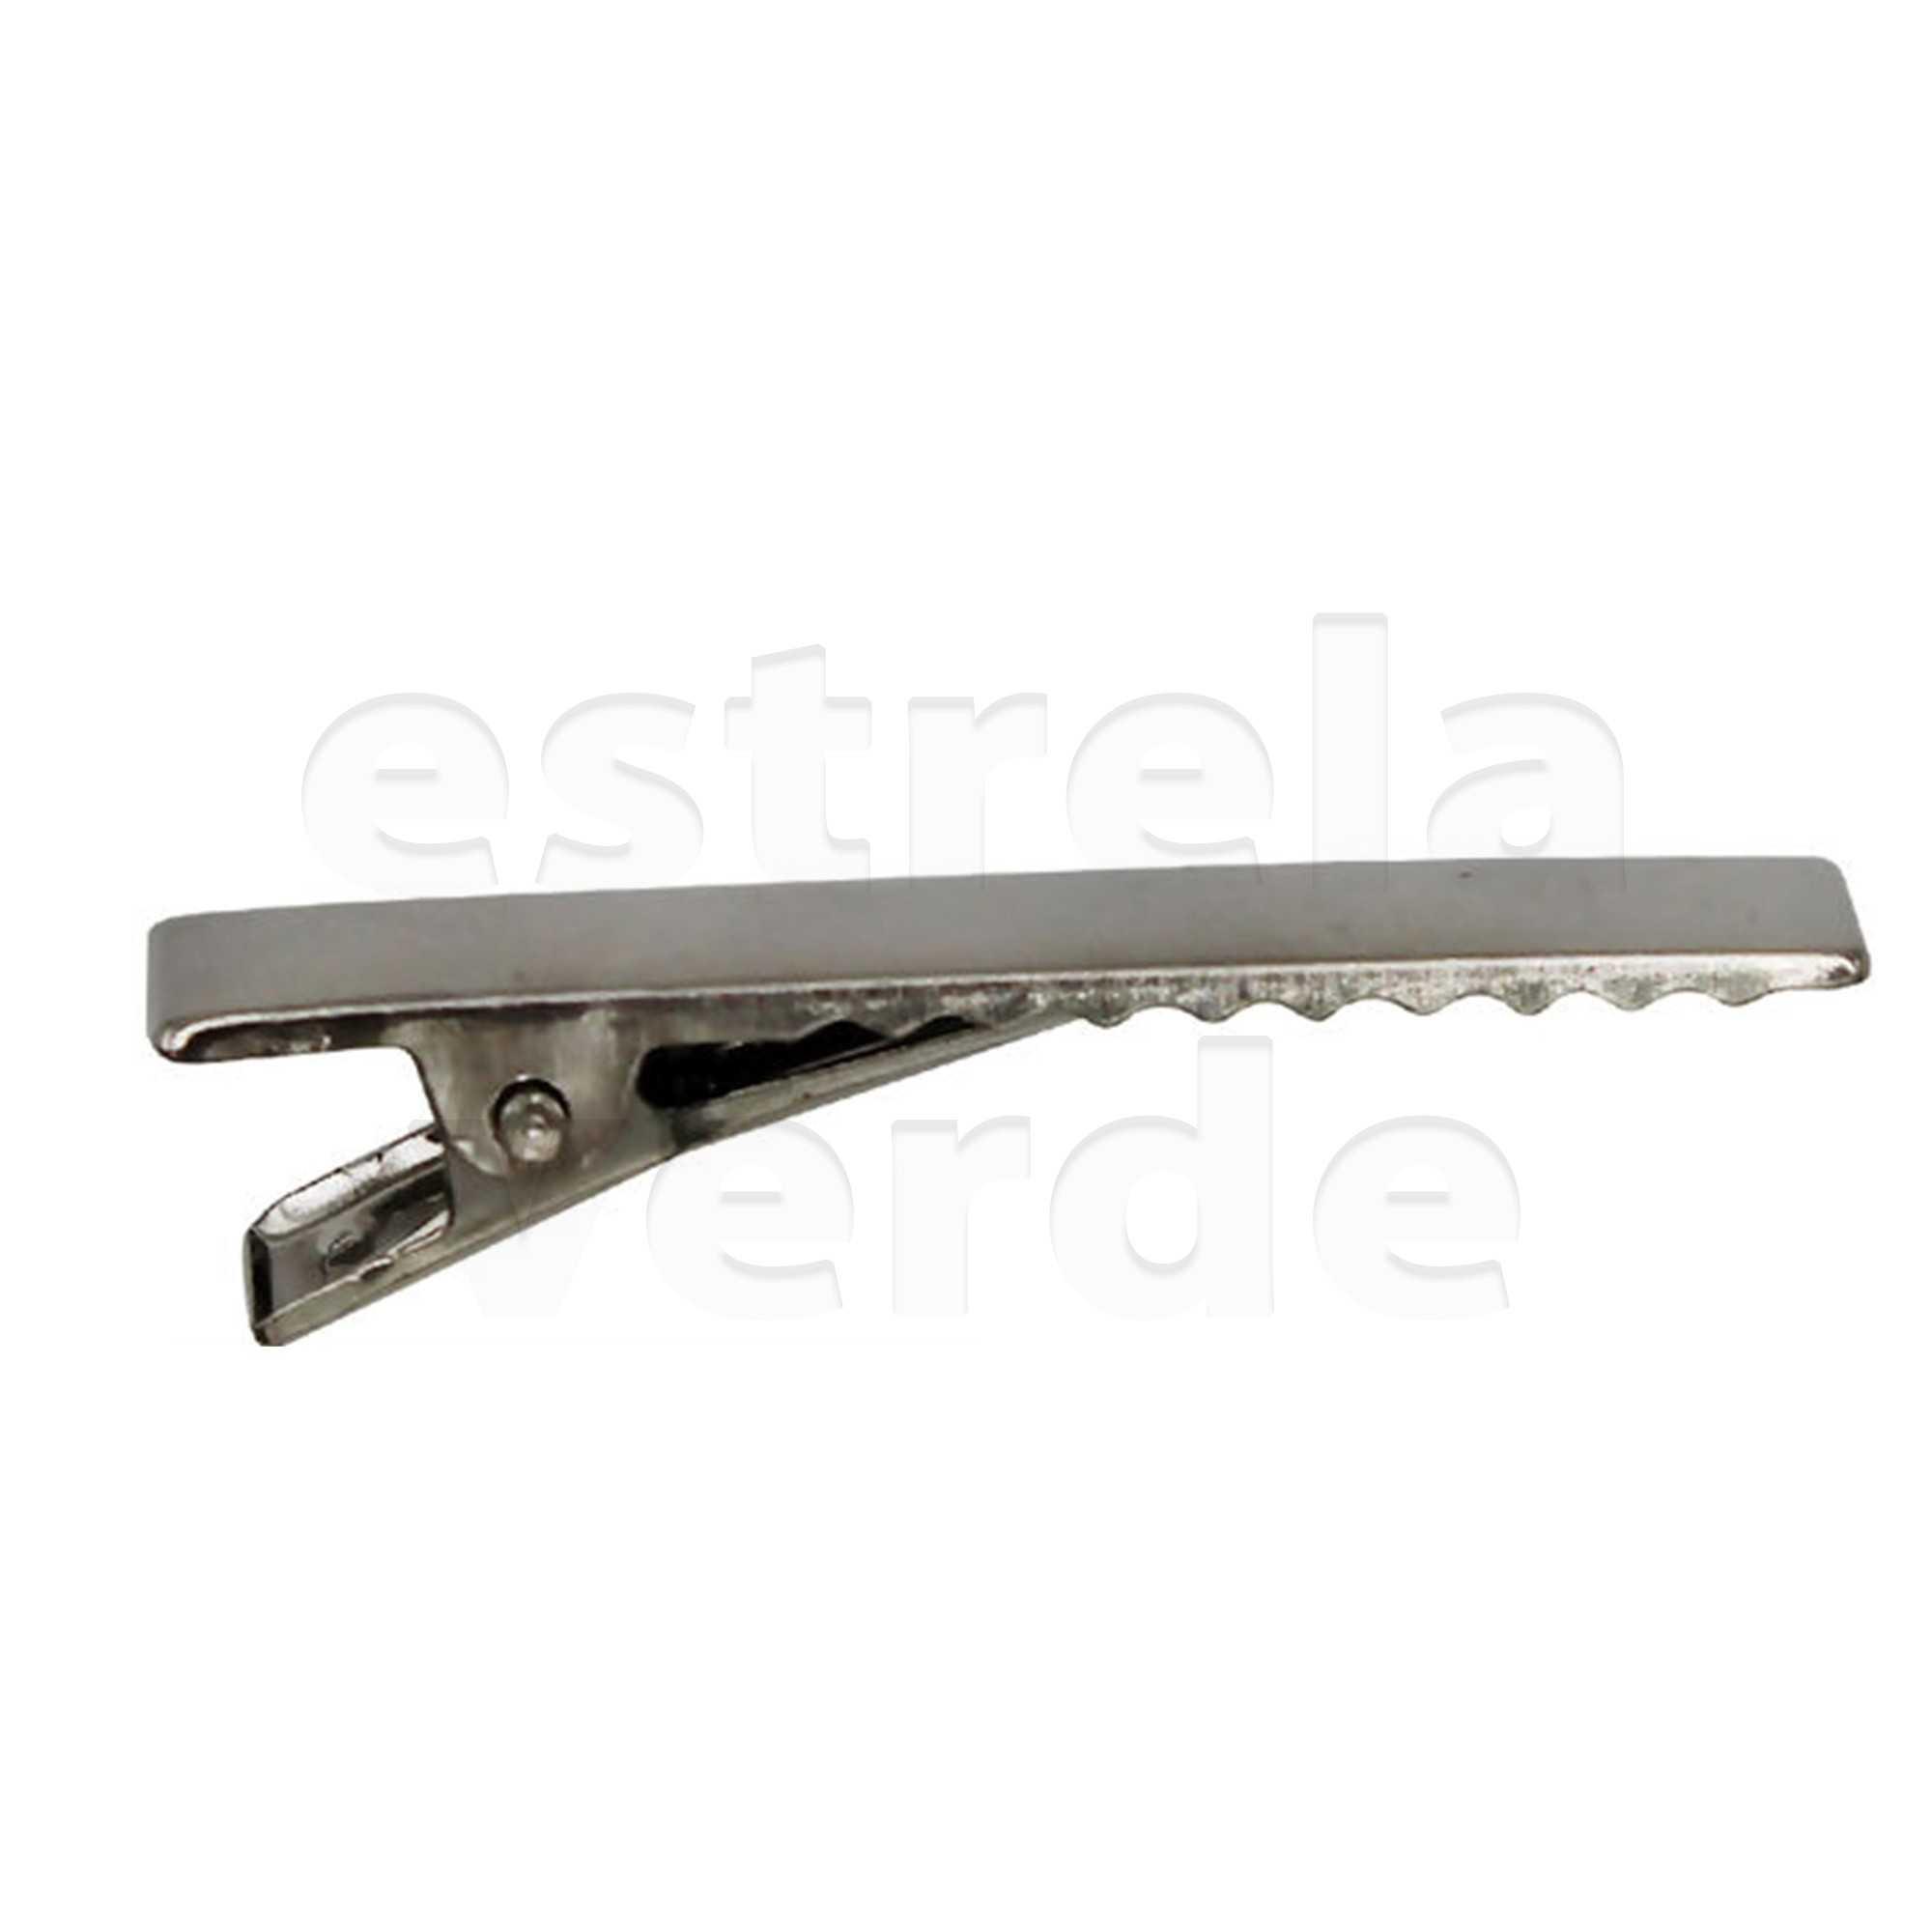 PRESILHA JACARE 42MM RO115116 C/100UN NIQUEL  - Estrela Verde